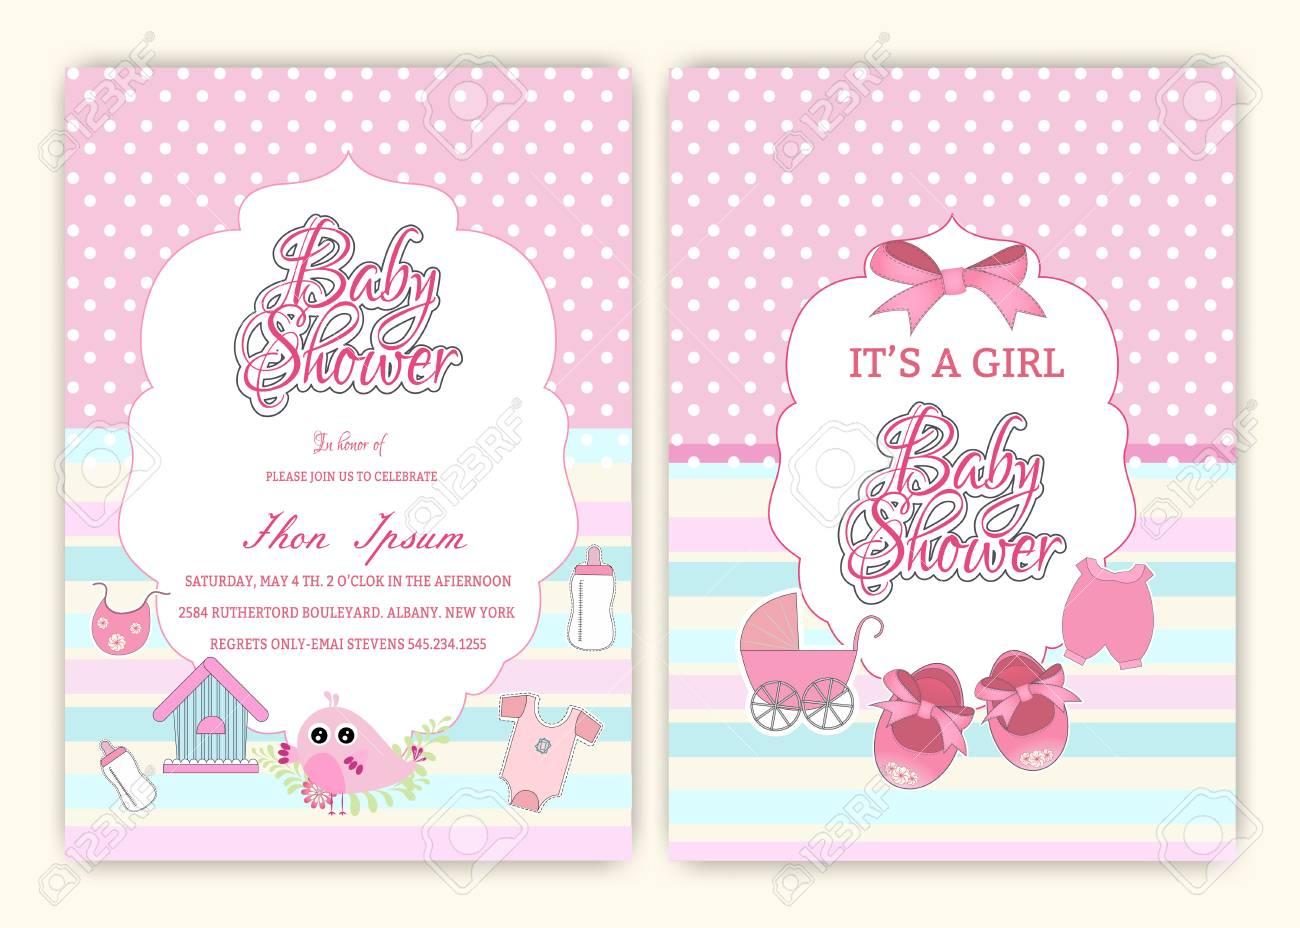 baby shower party invitation design template ロイヤリティフリー